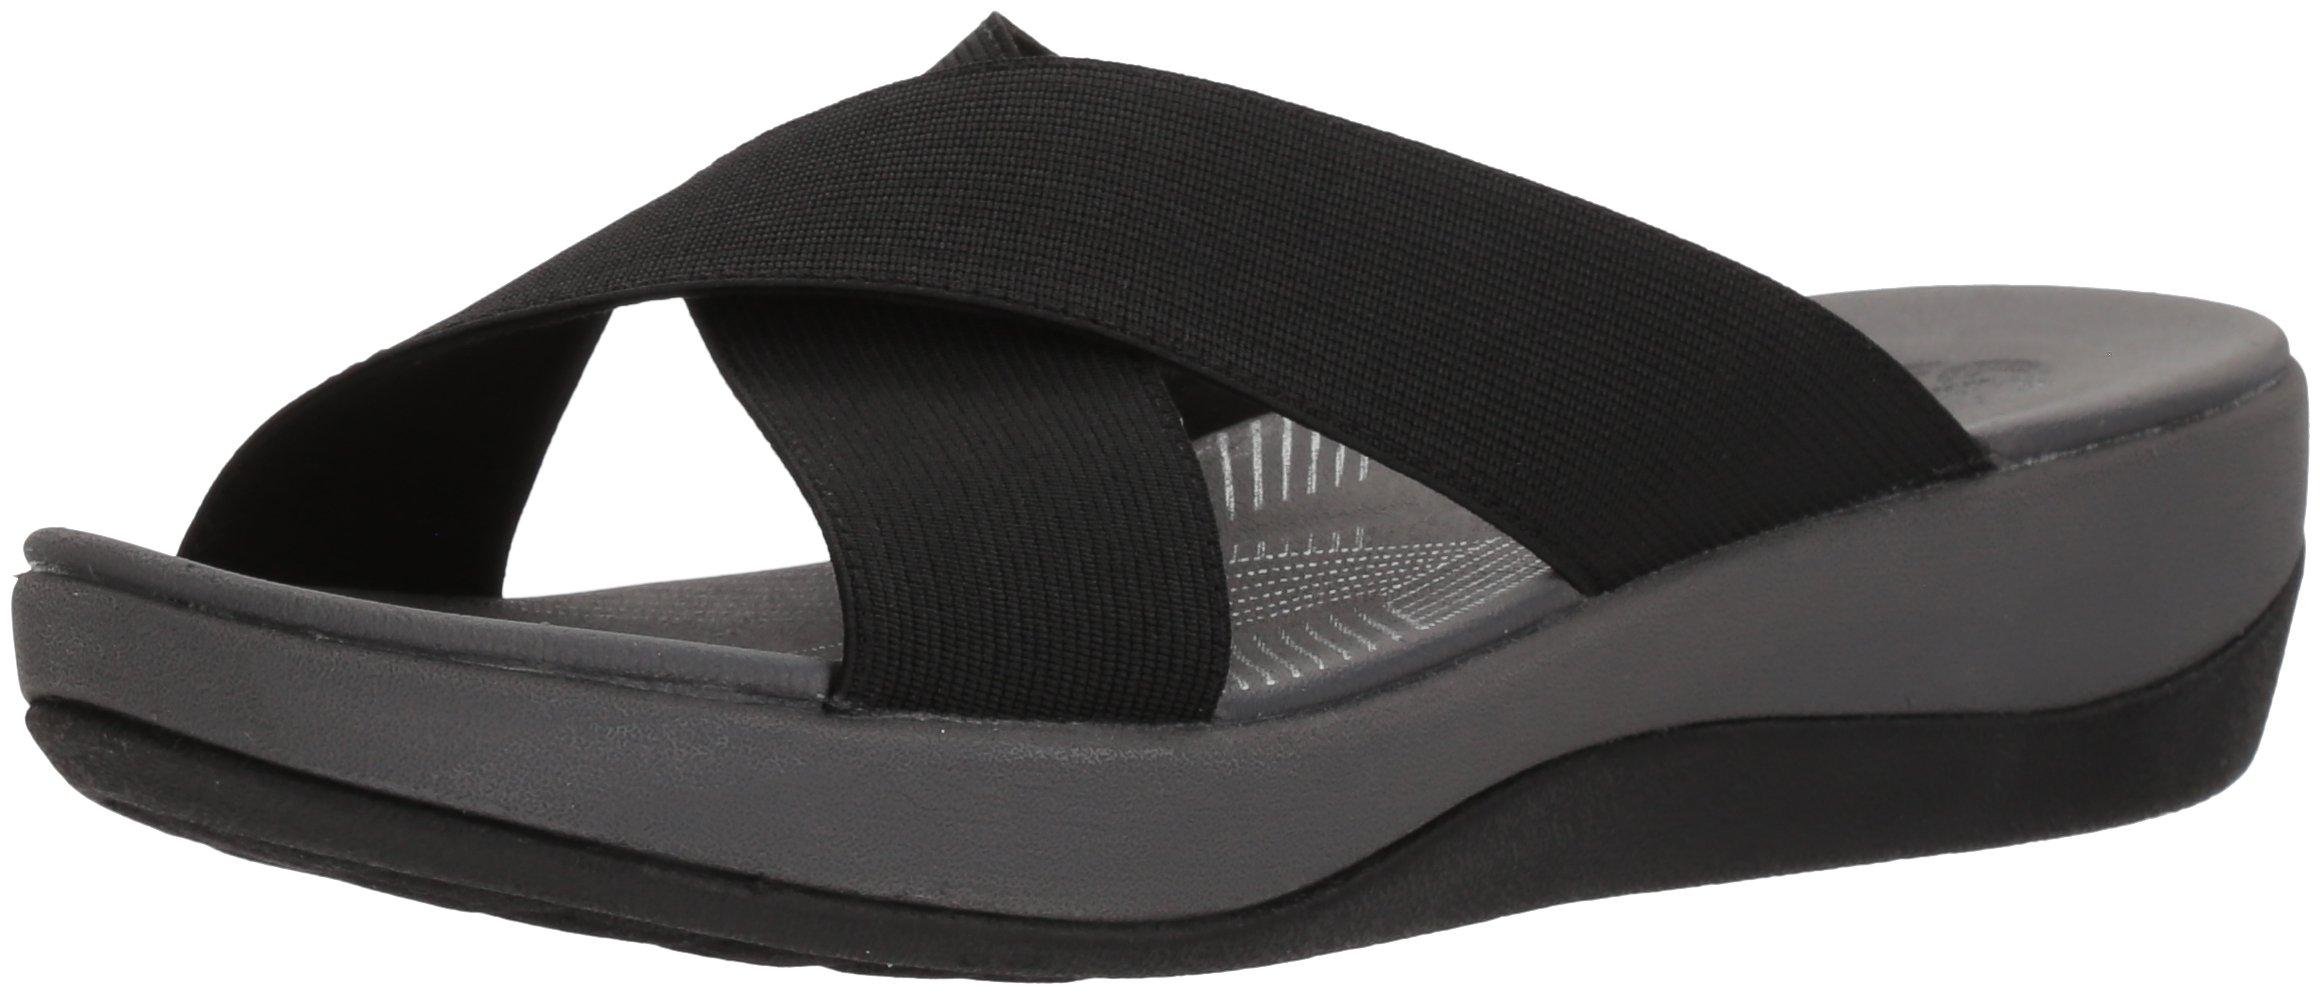 CLARKS Women's Arla Elin Sandal, Black Solid Textile, 11 Medium US